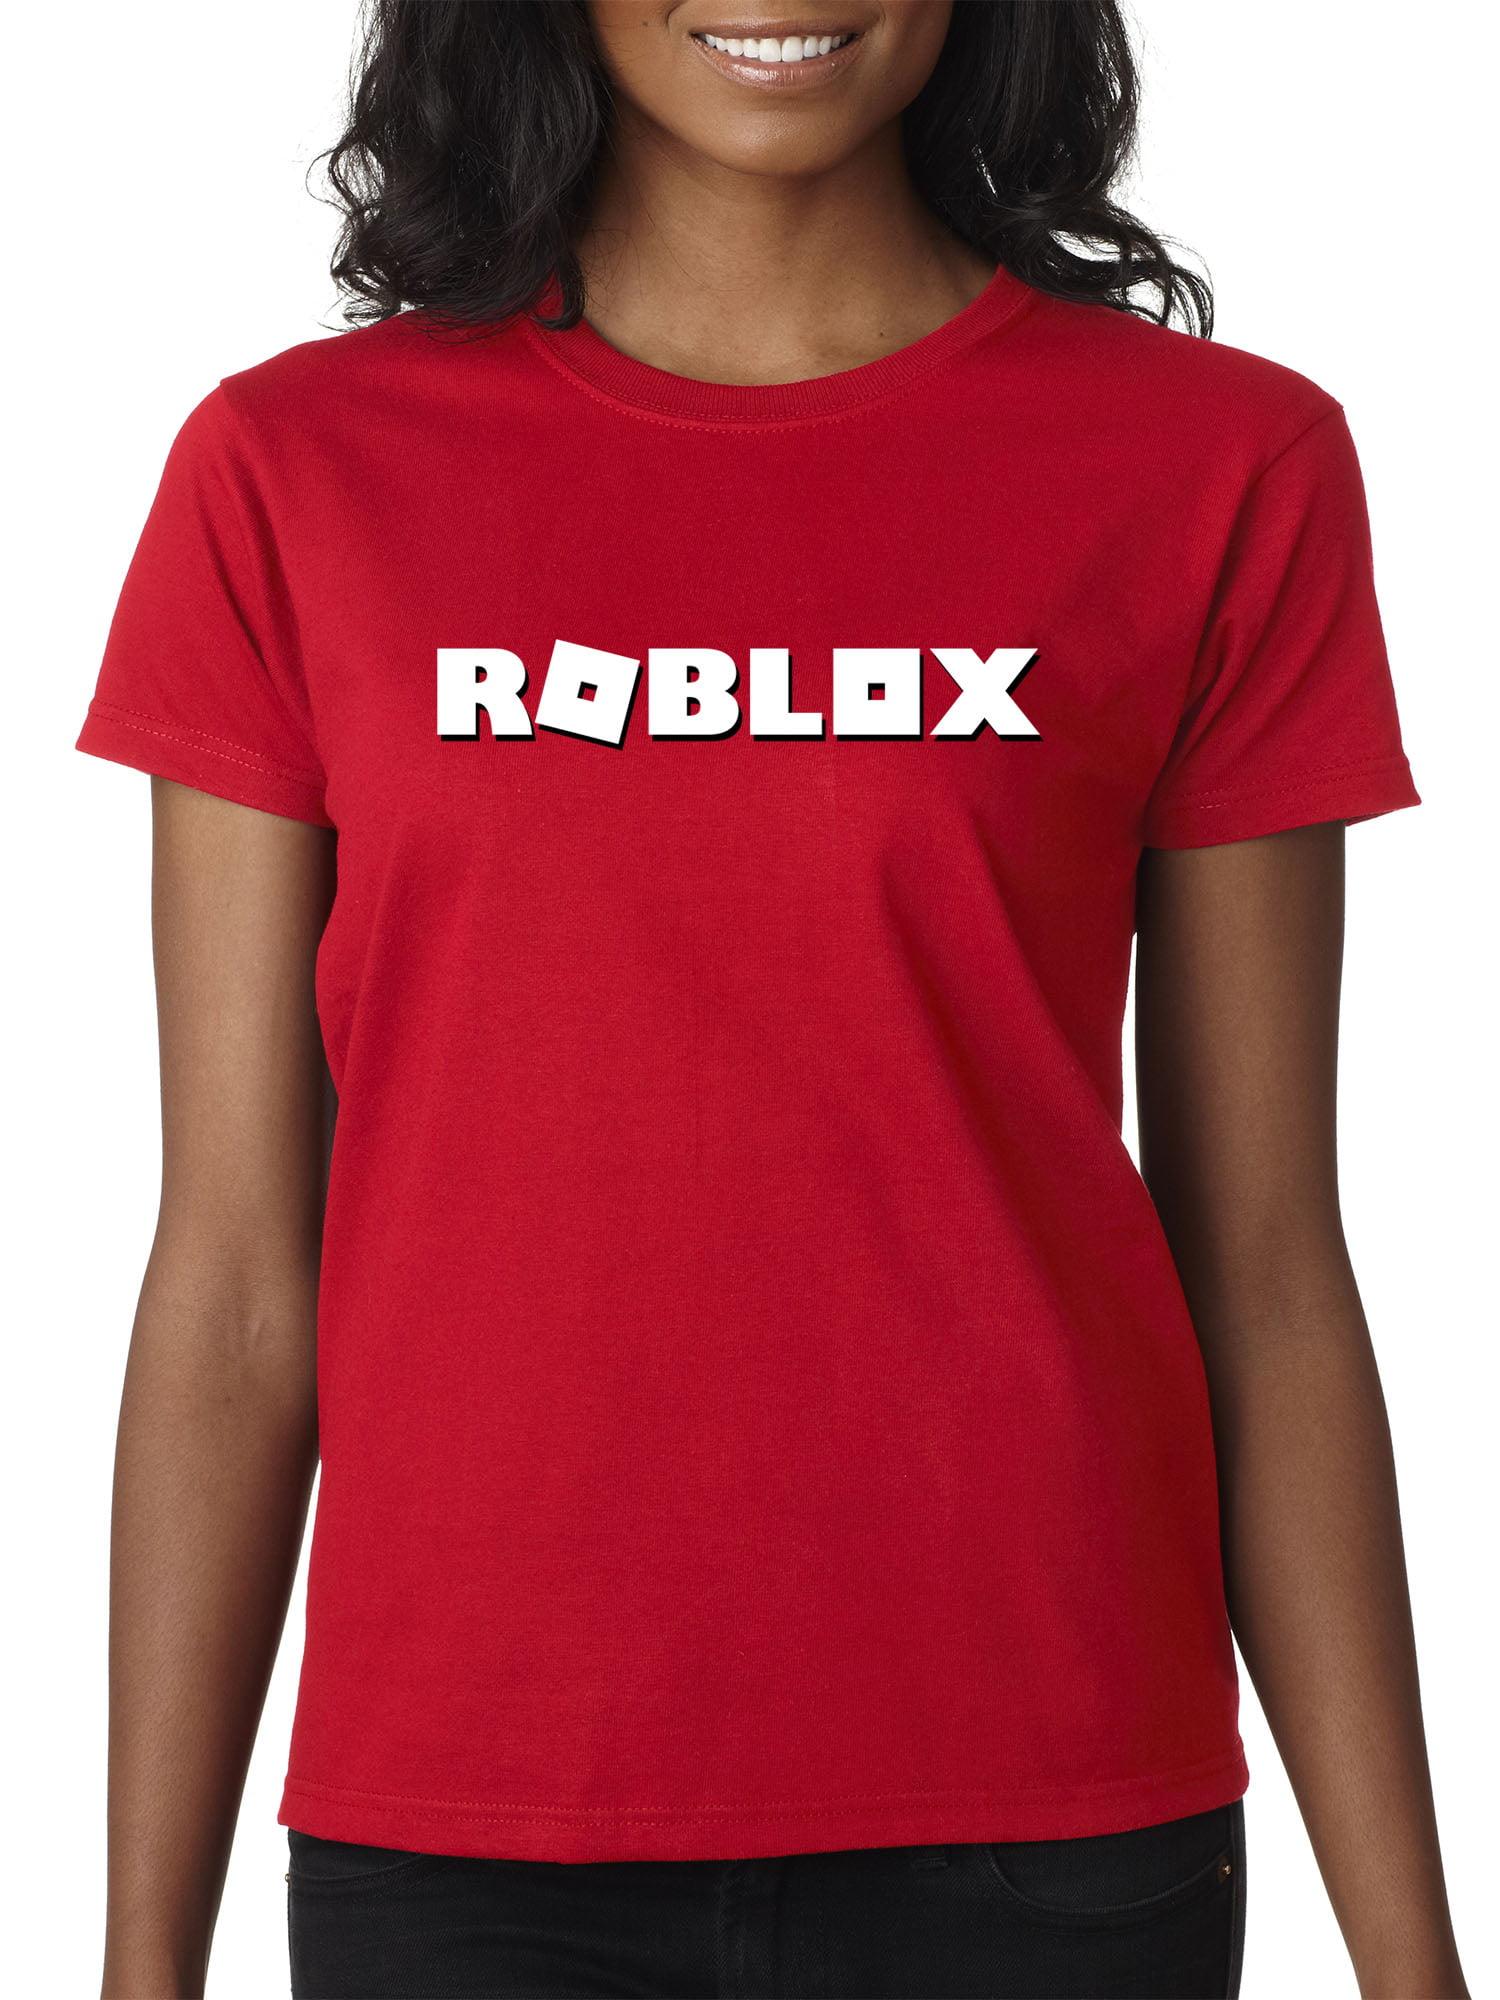 New Way New Way 923 Women S T Shirt Roblox Logo Game Accent Xs